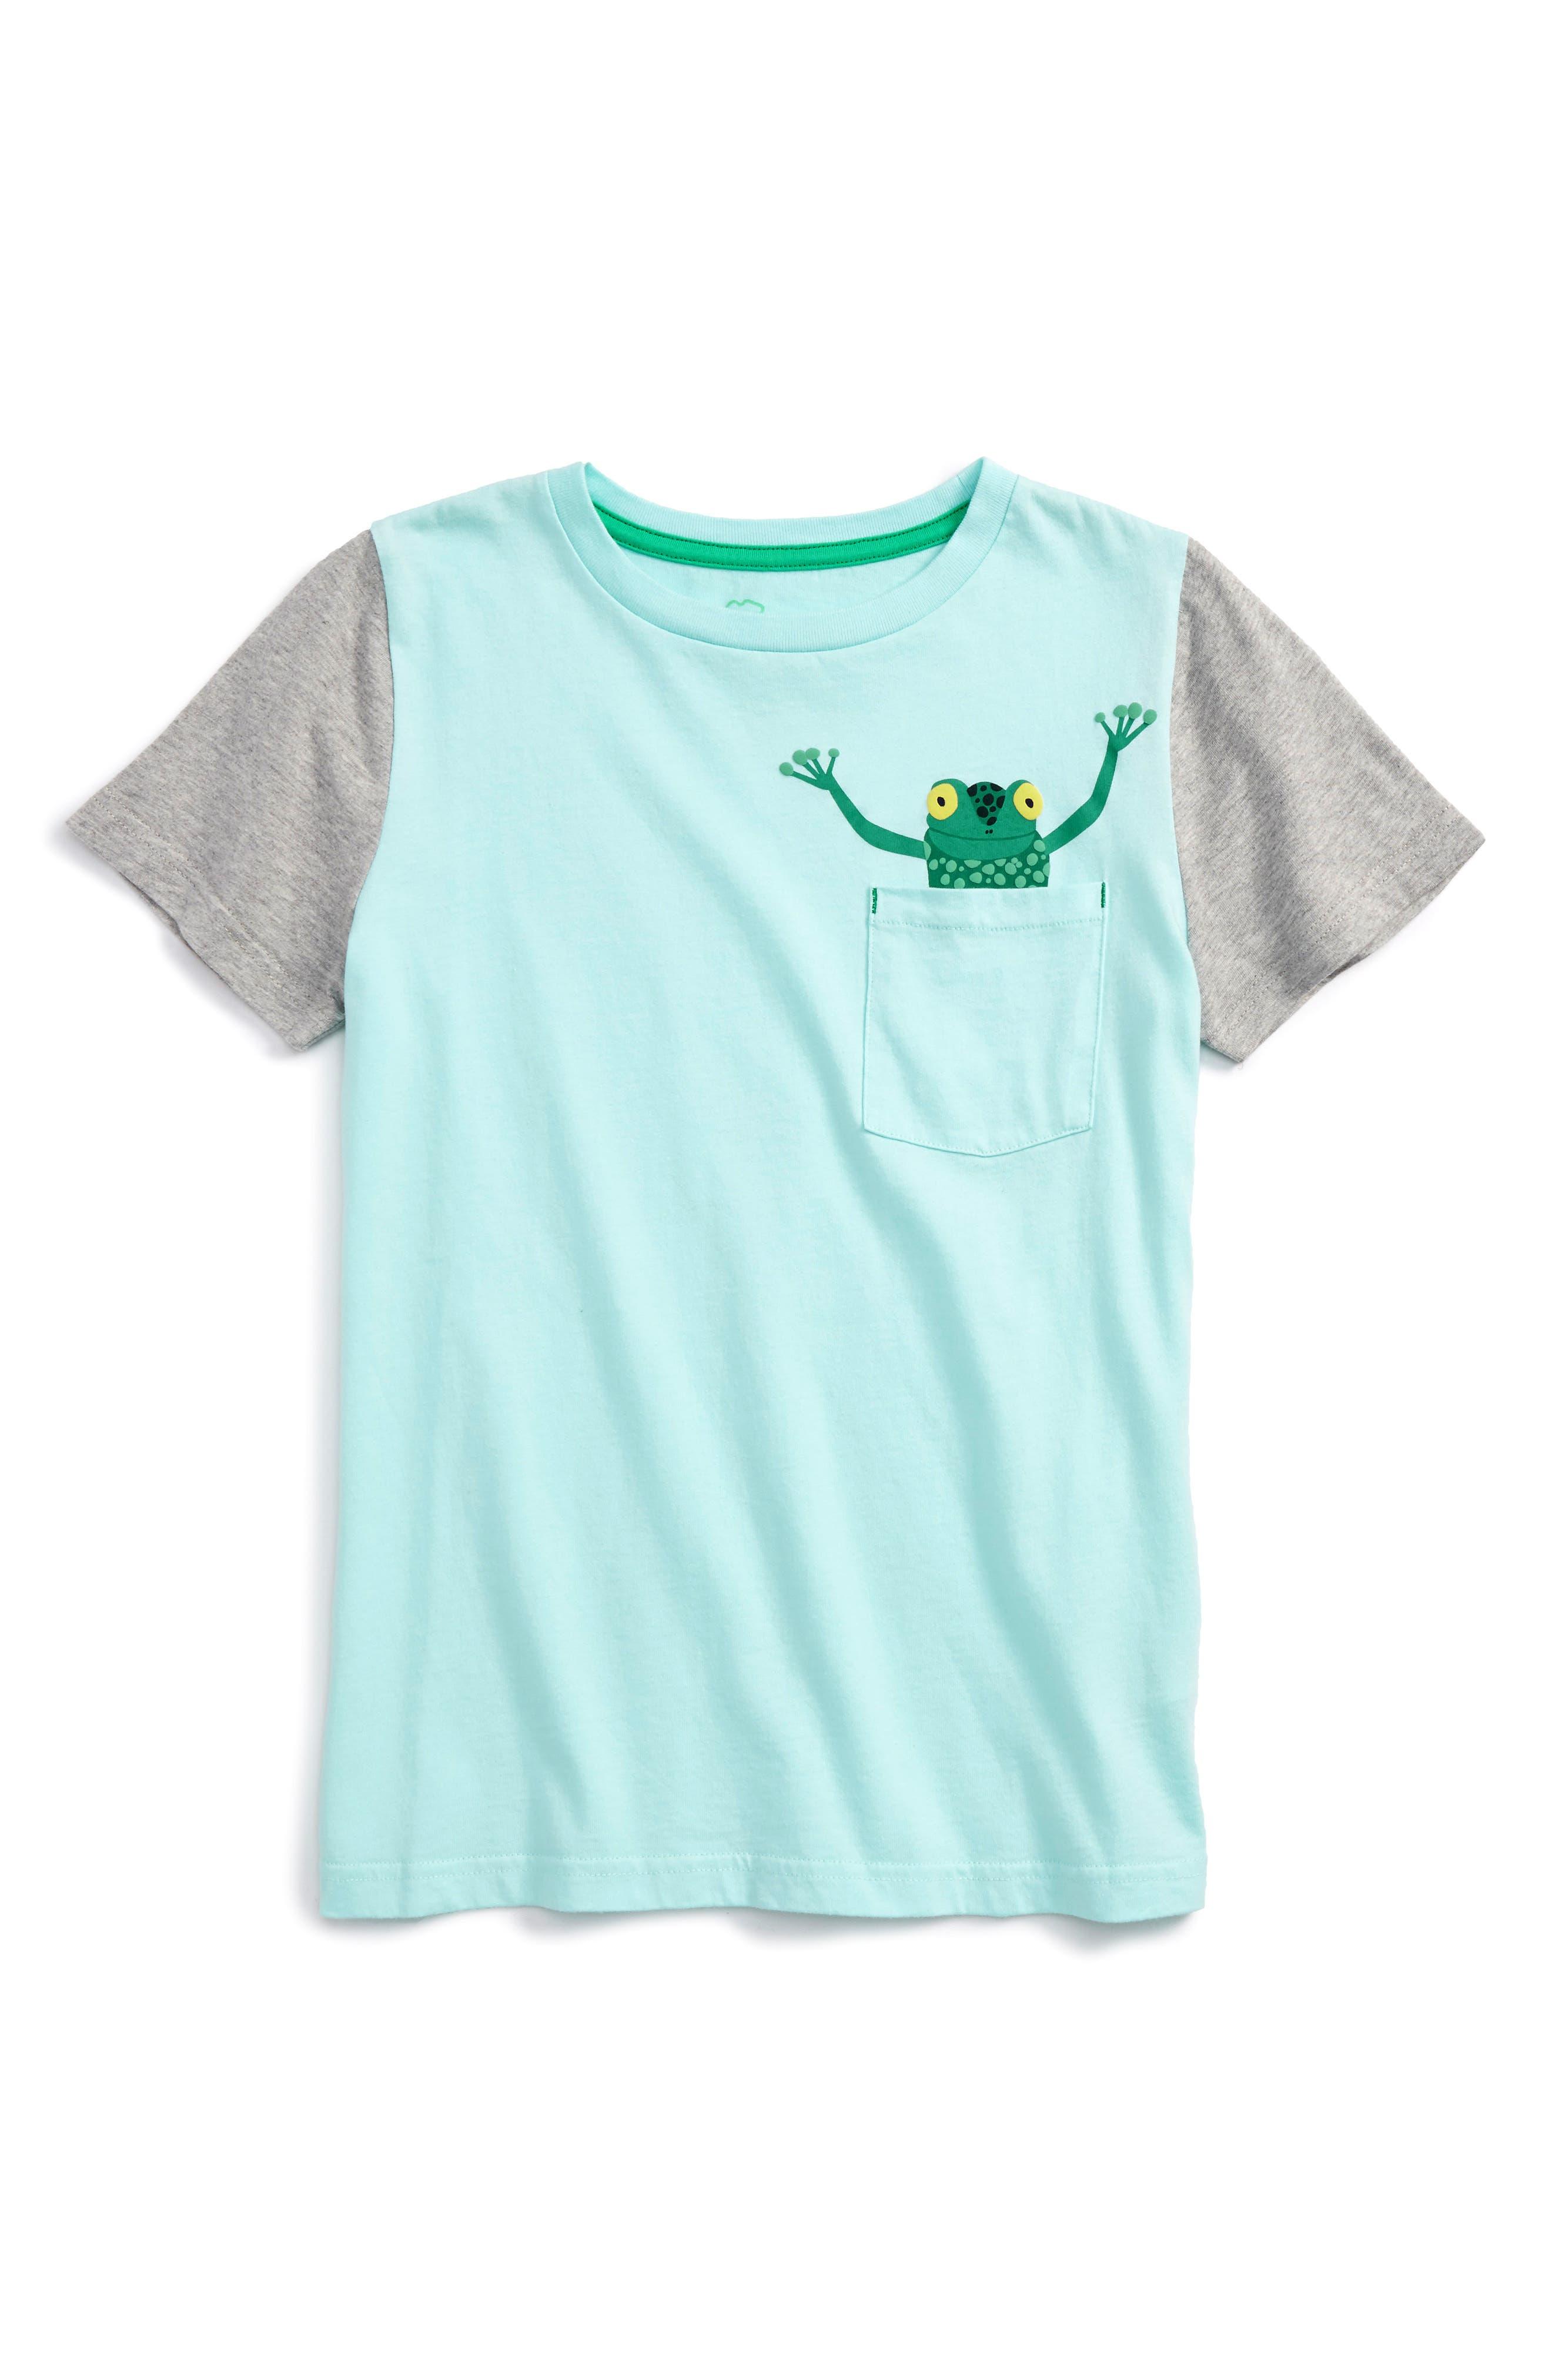 Main Image - Mini Boden Pocket Friends T-Shirt (Toddler Boys, Little Boys & Big Boys)